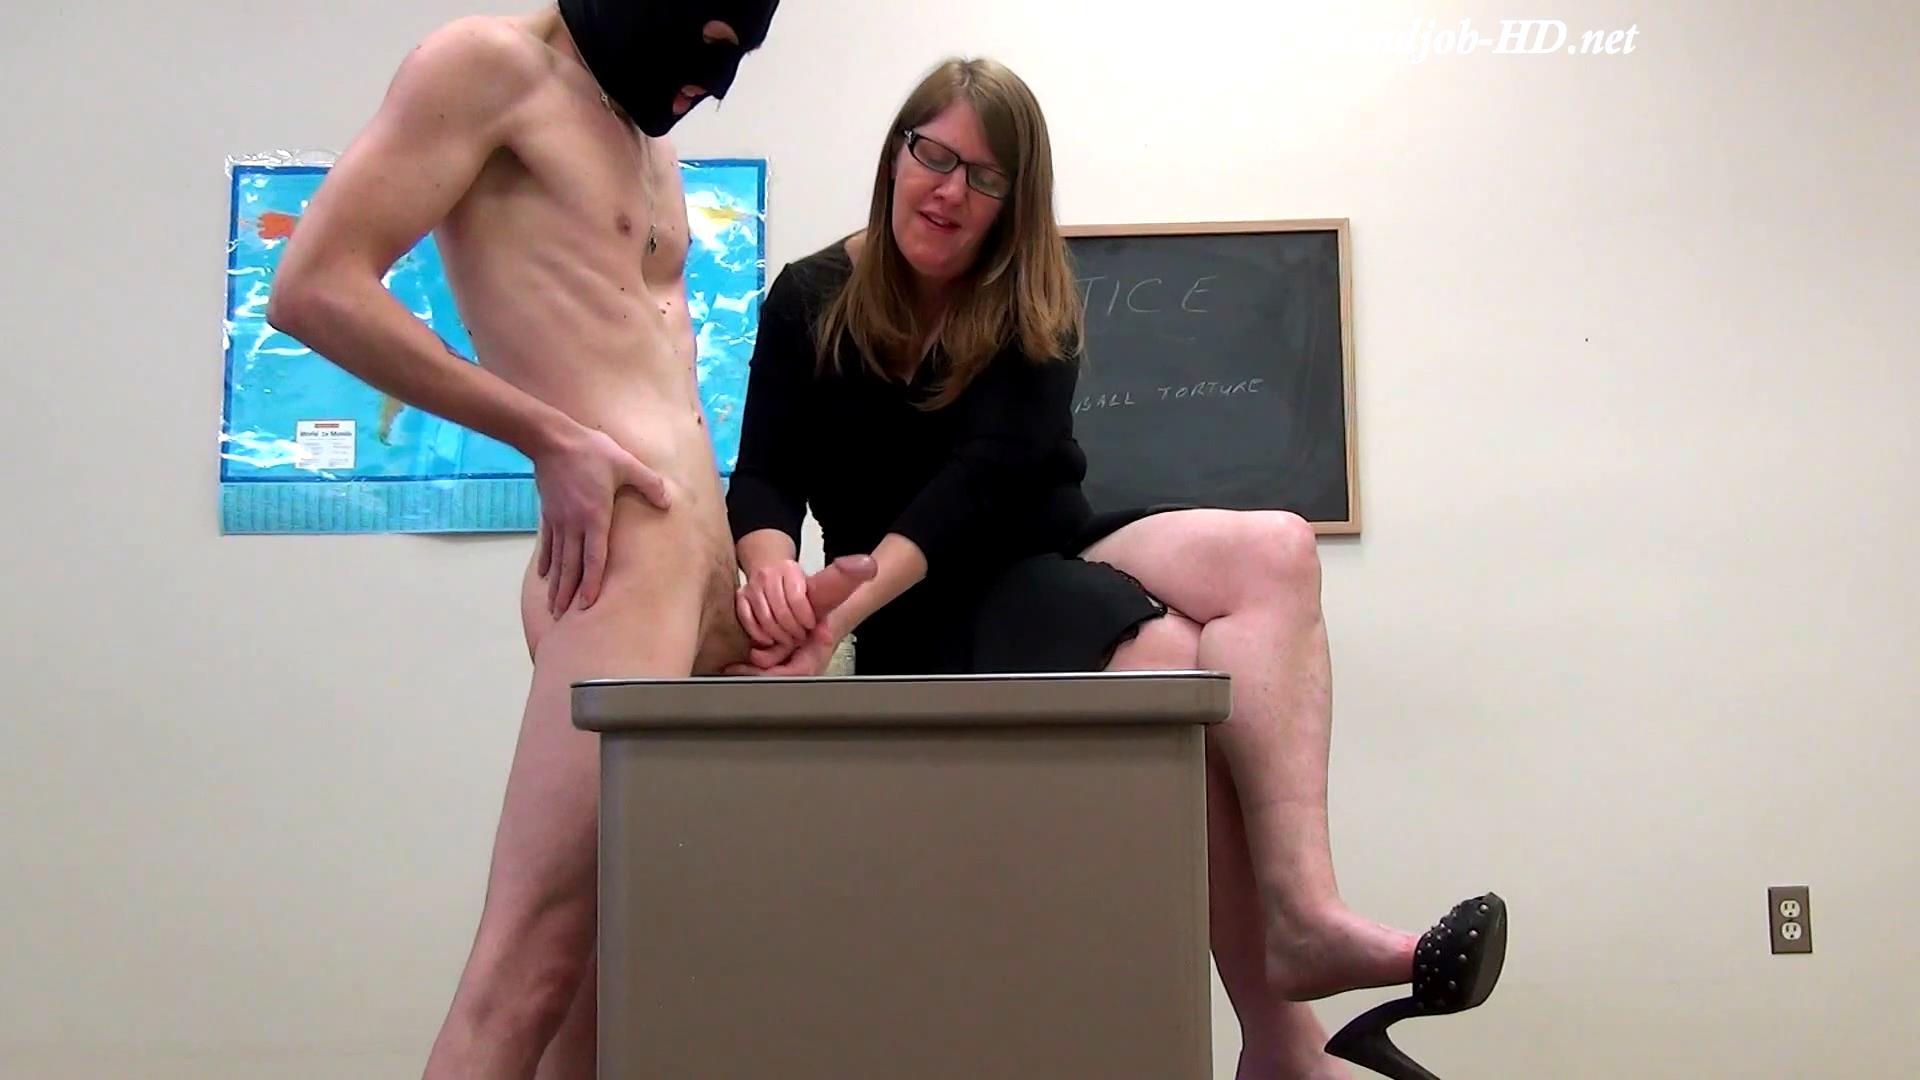 Cock_And_Ball_Torture_-_JERKY_GIRLS.jpg